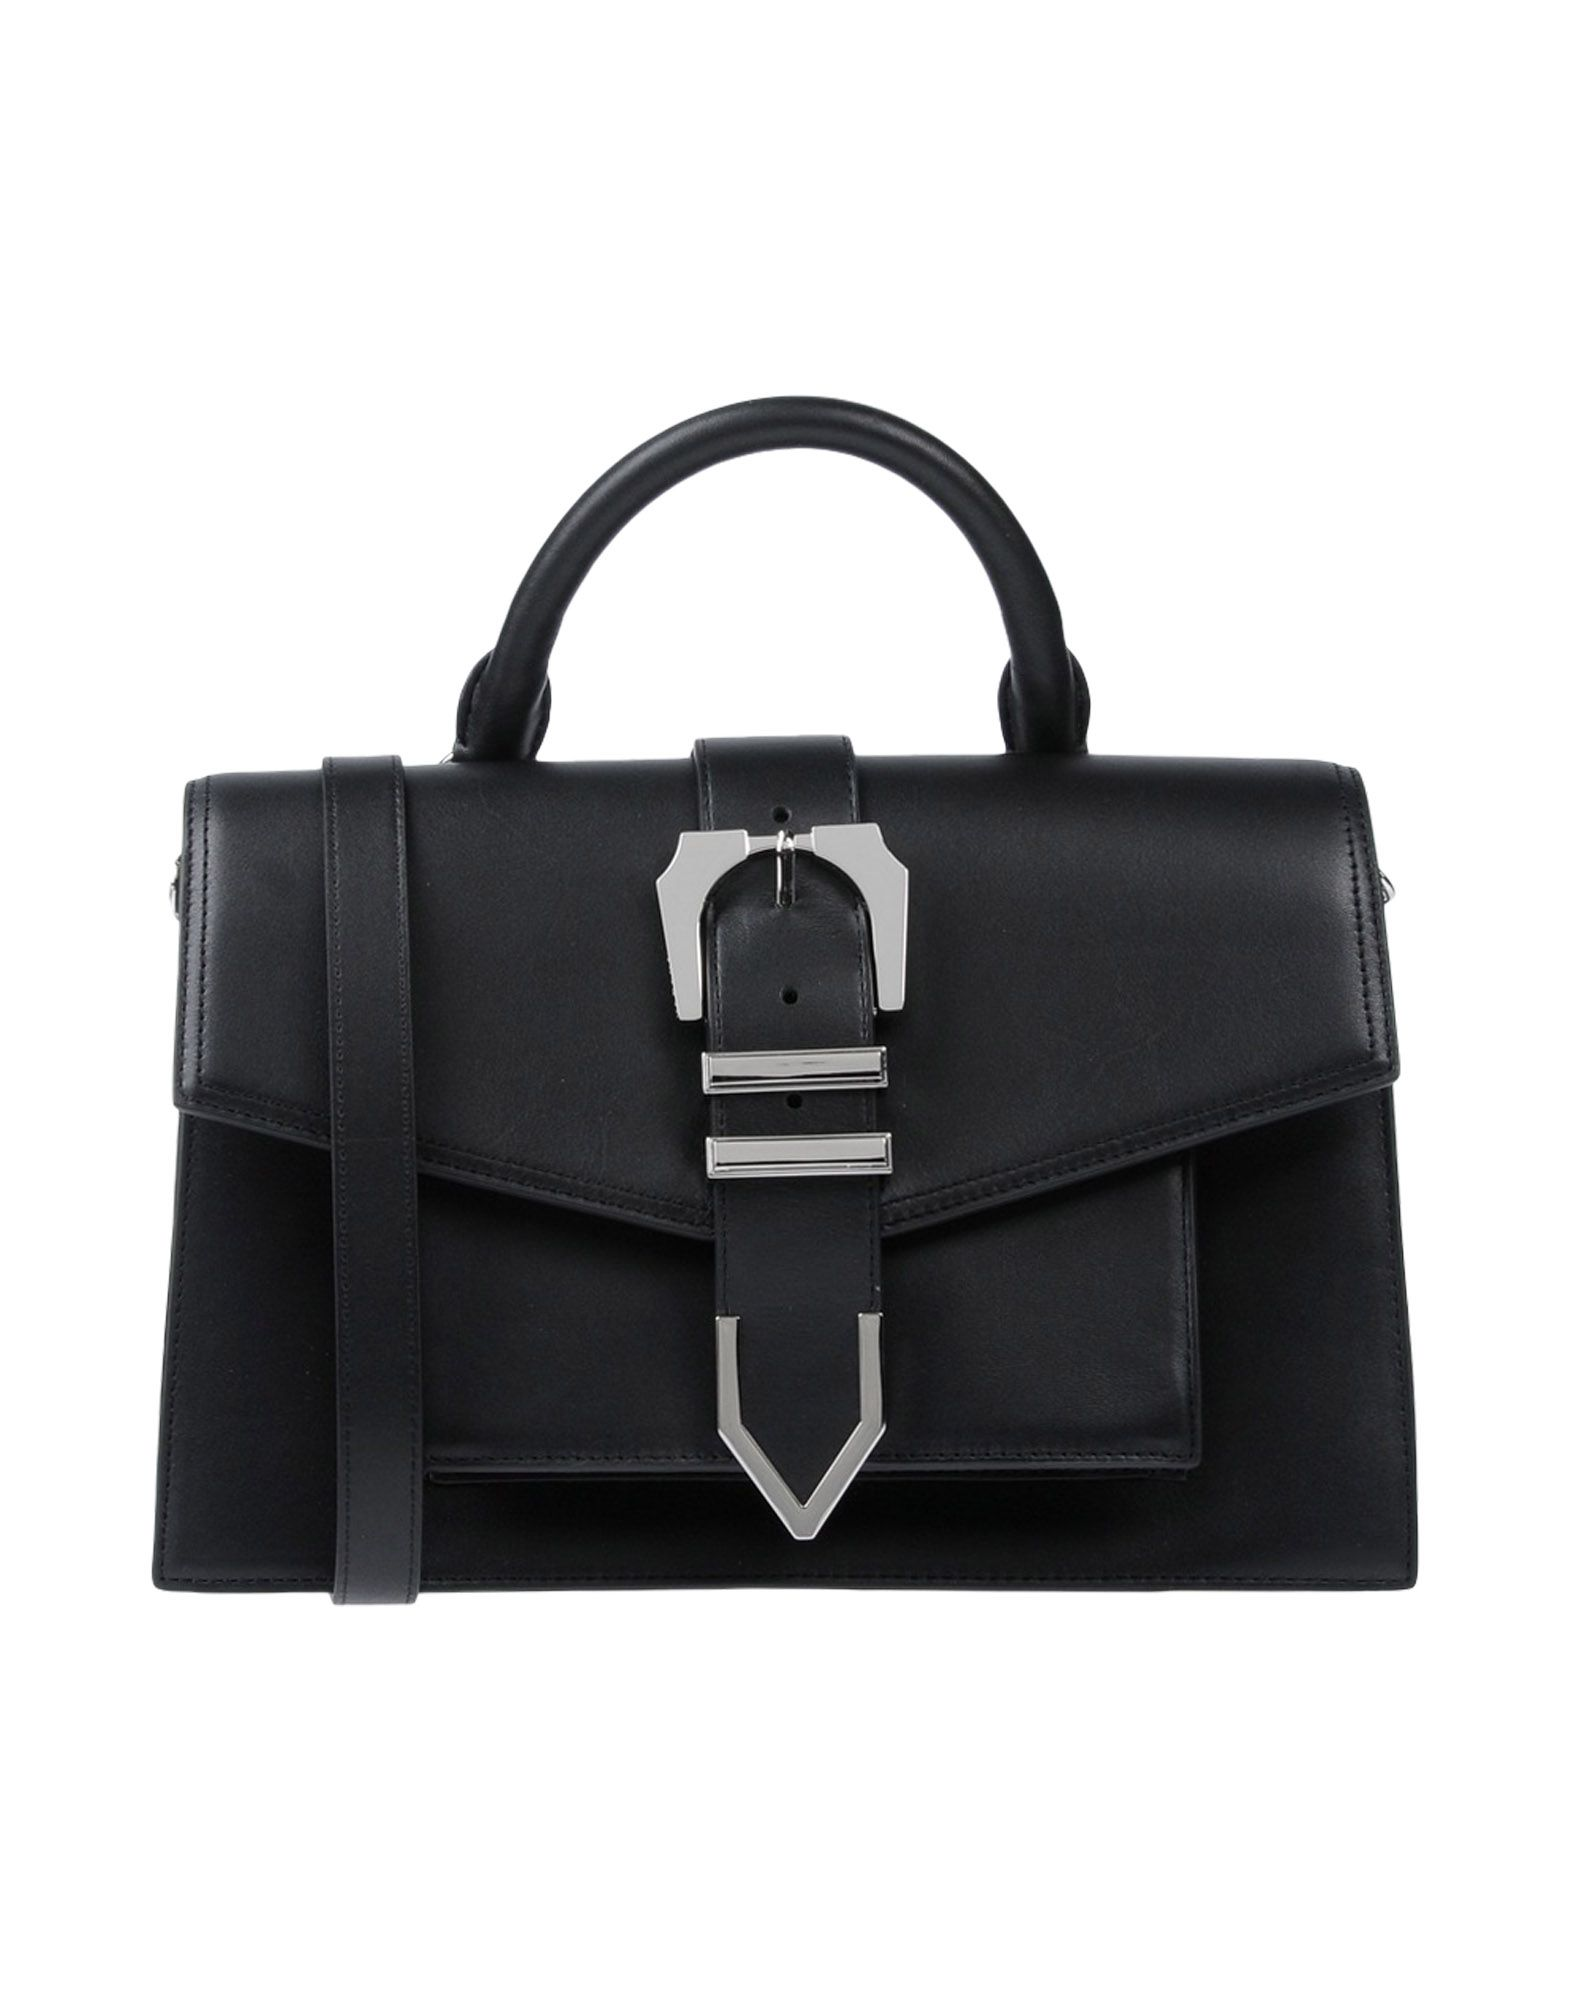 a63b6de454f Versus Handbags In Black   ModeSens